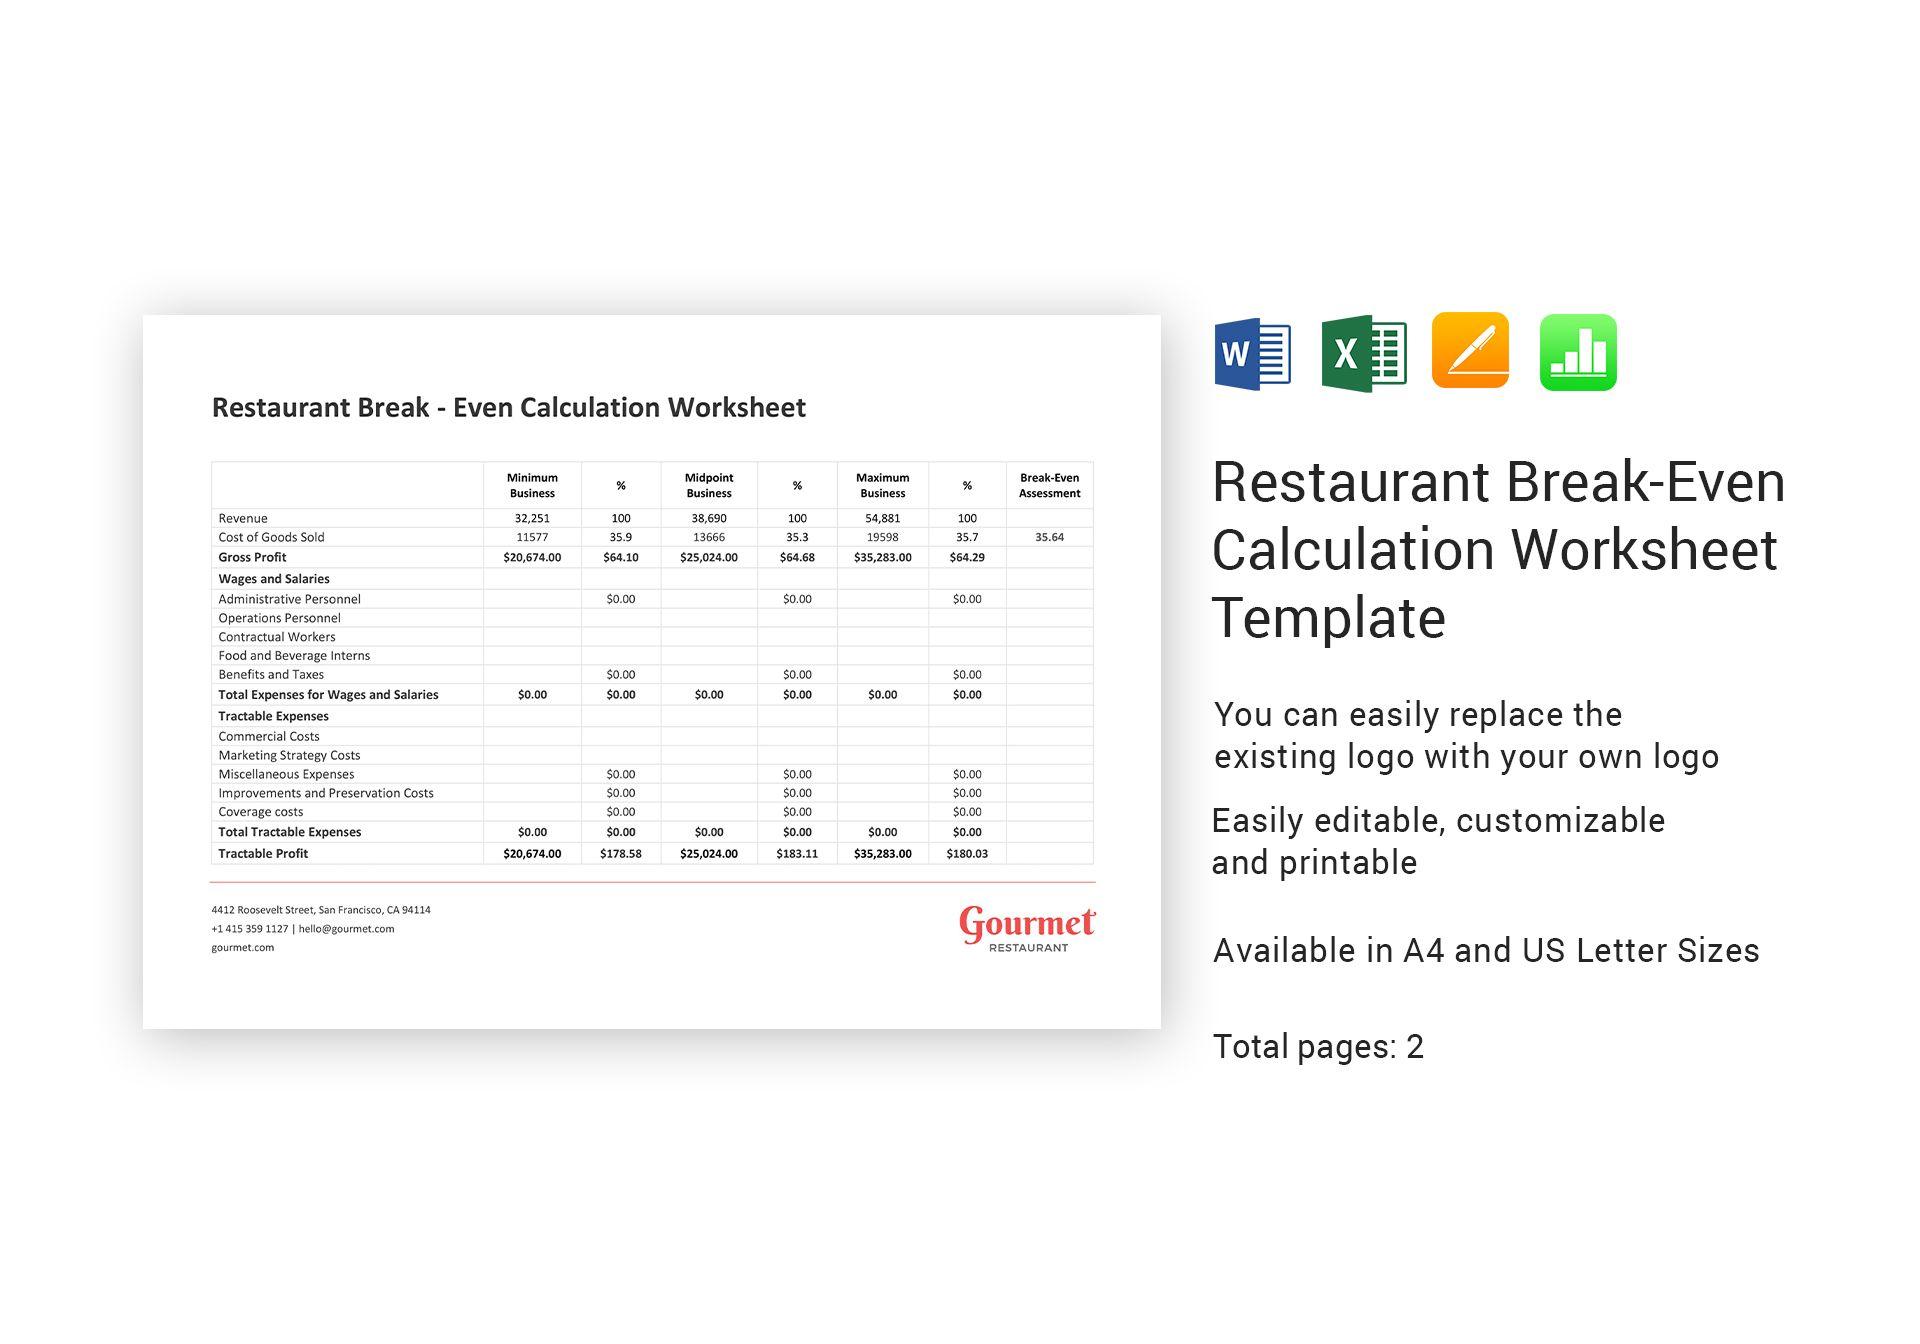 Restaurant Break Even Calculation Worksheet Template In